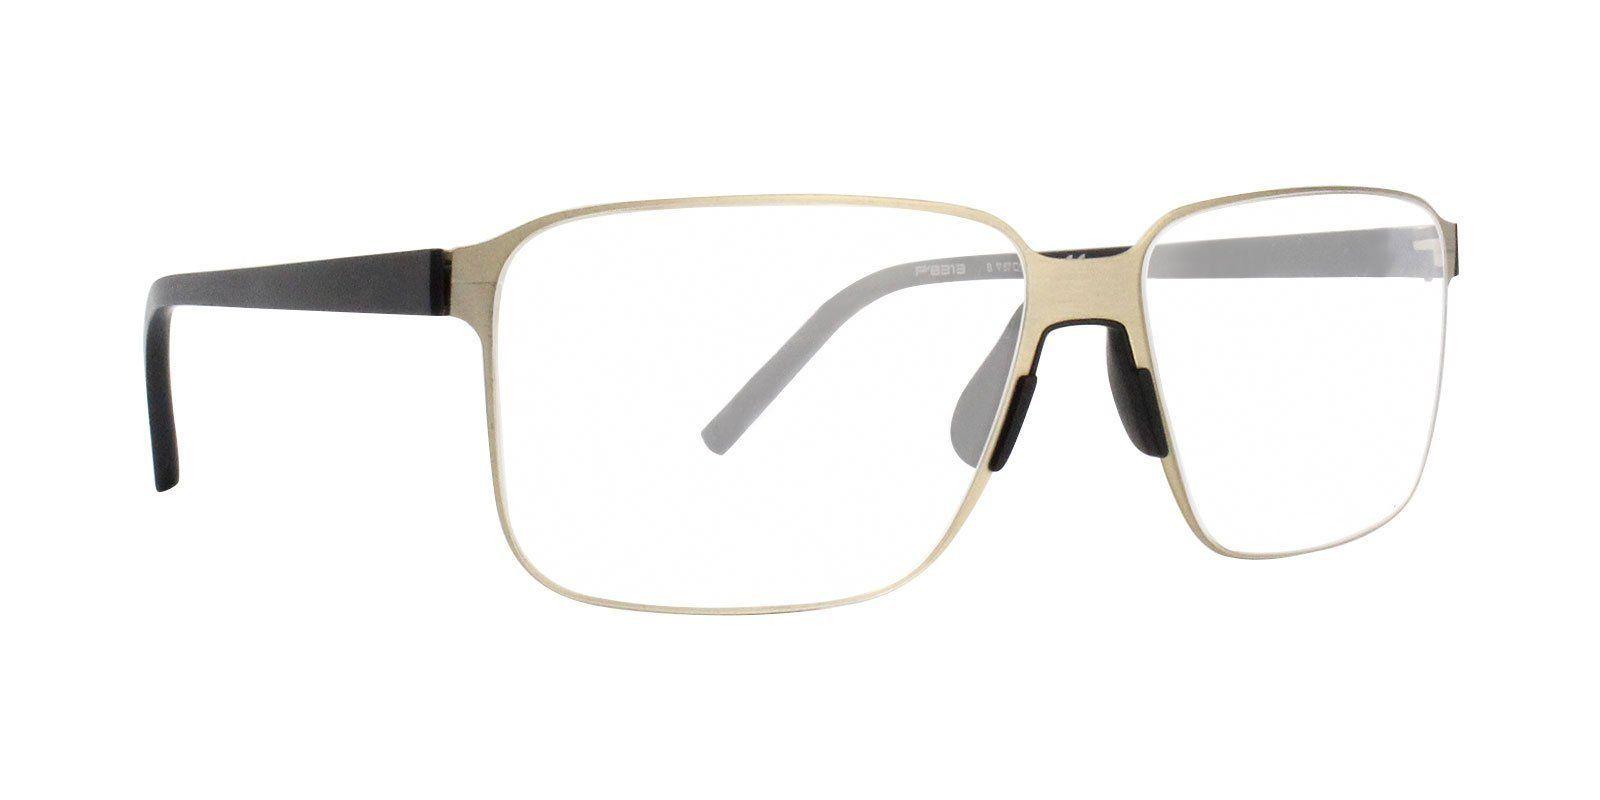 5b6be20a4e8 Porsche Design - P8313 Gold-eyeglasses-Designer Eyes